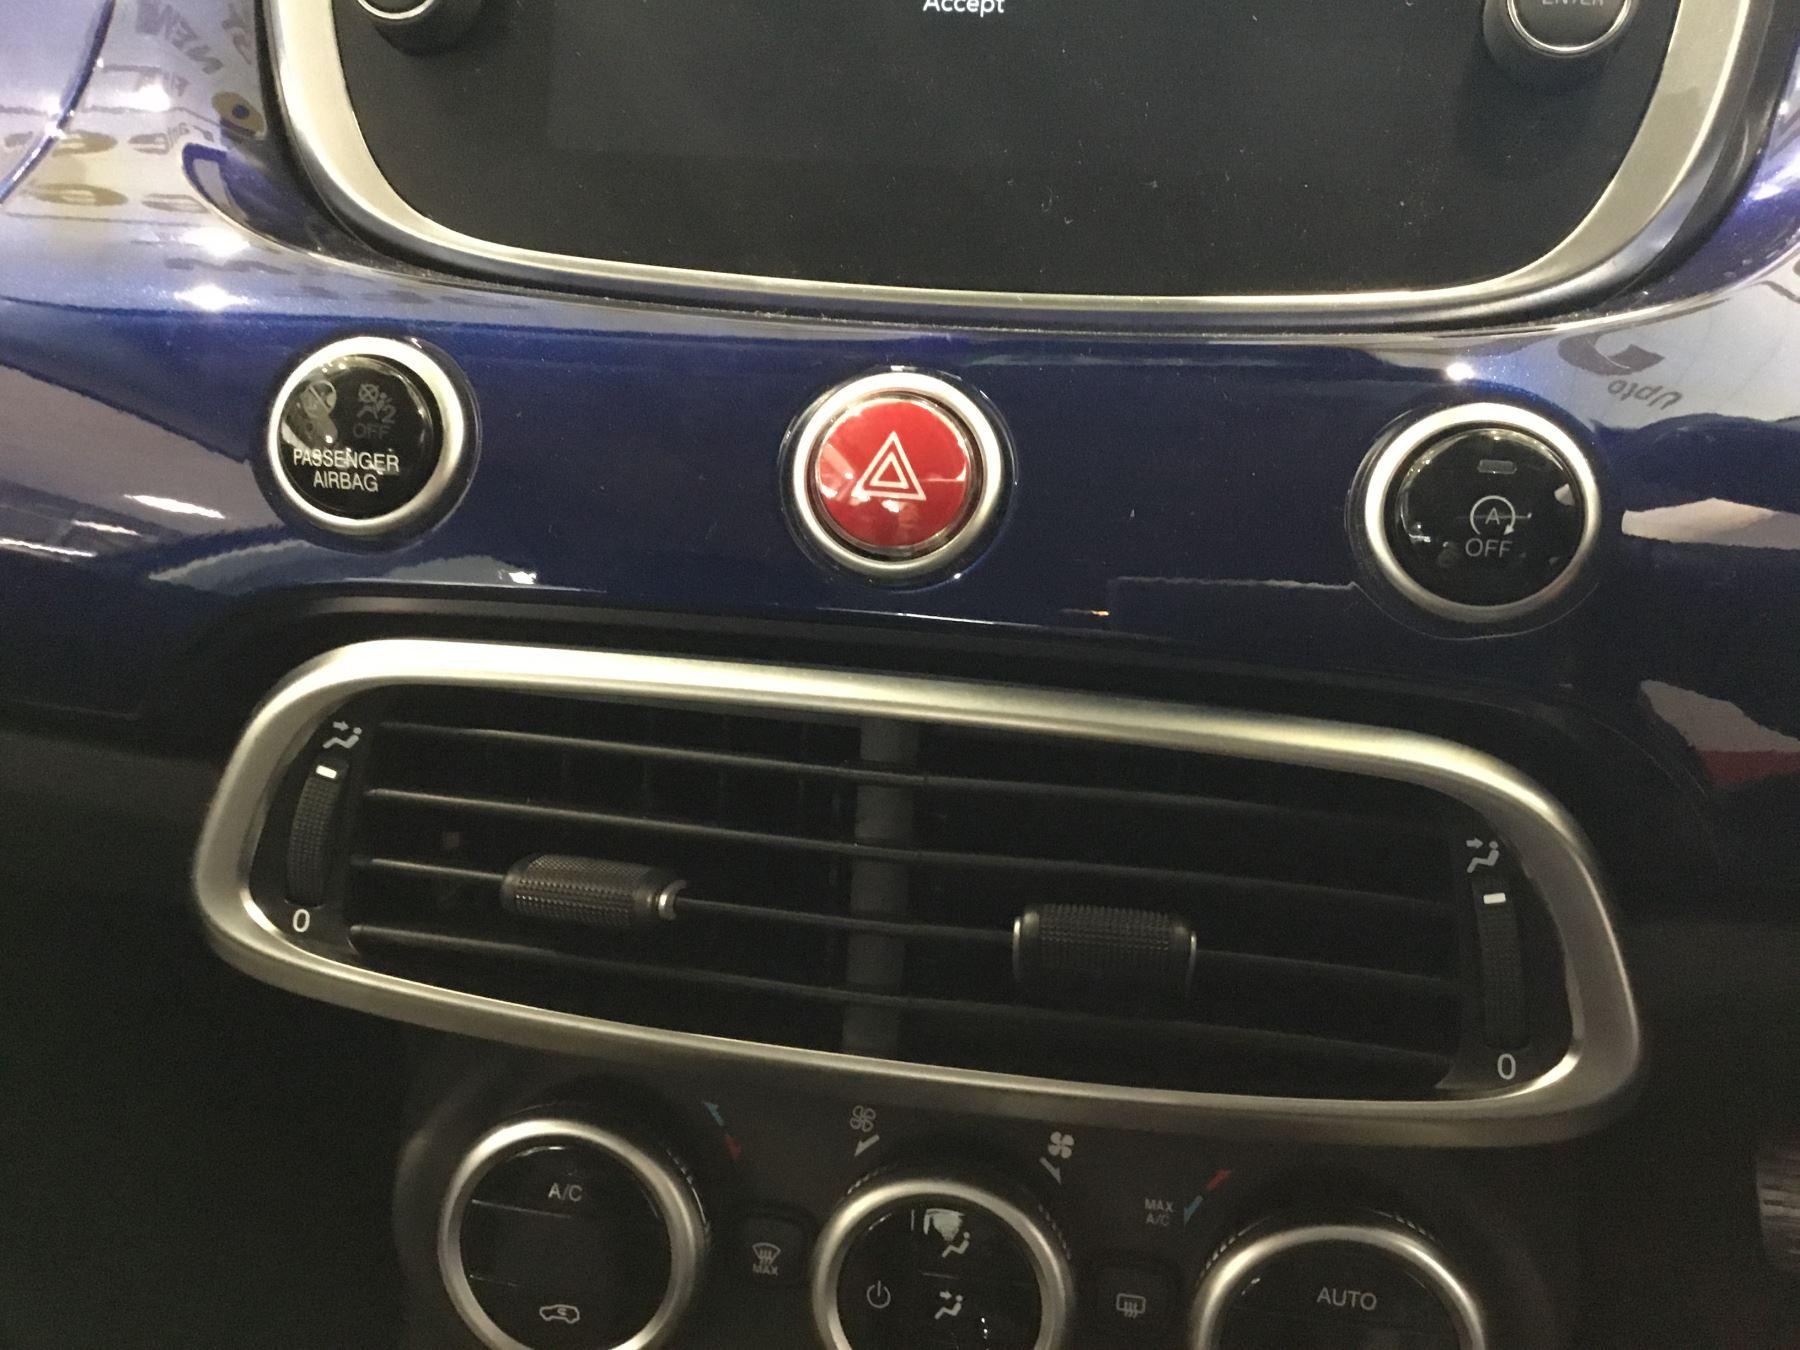 Fiat 500X 1.3 City Cross DCT image 10